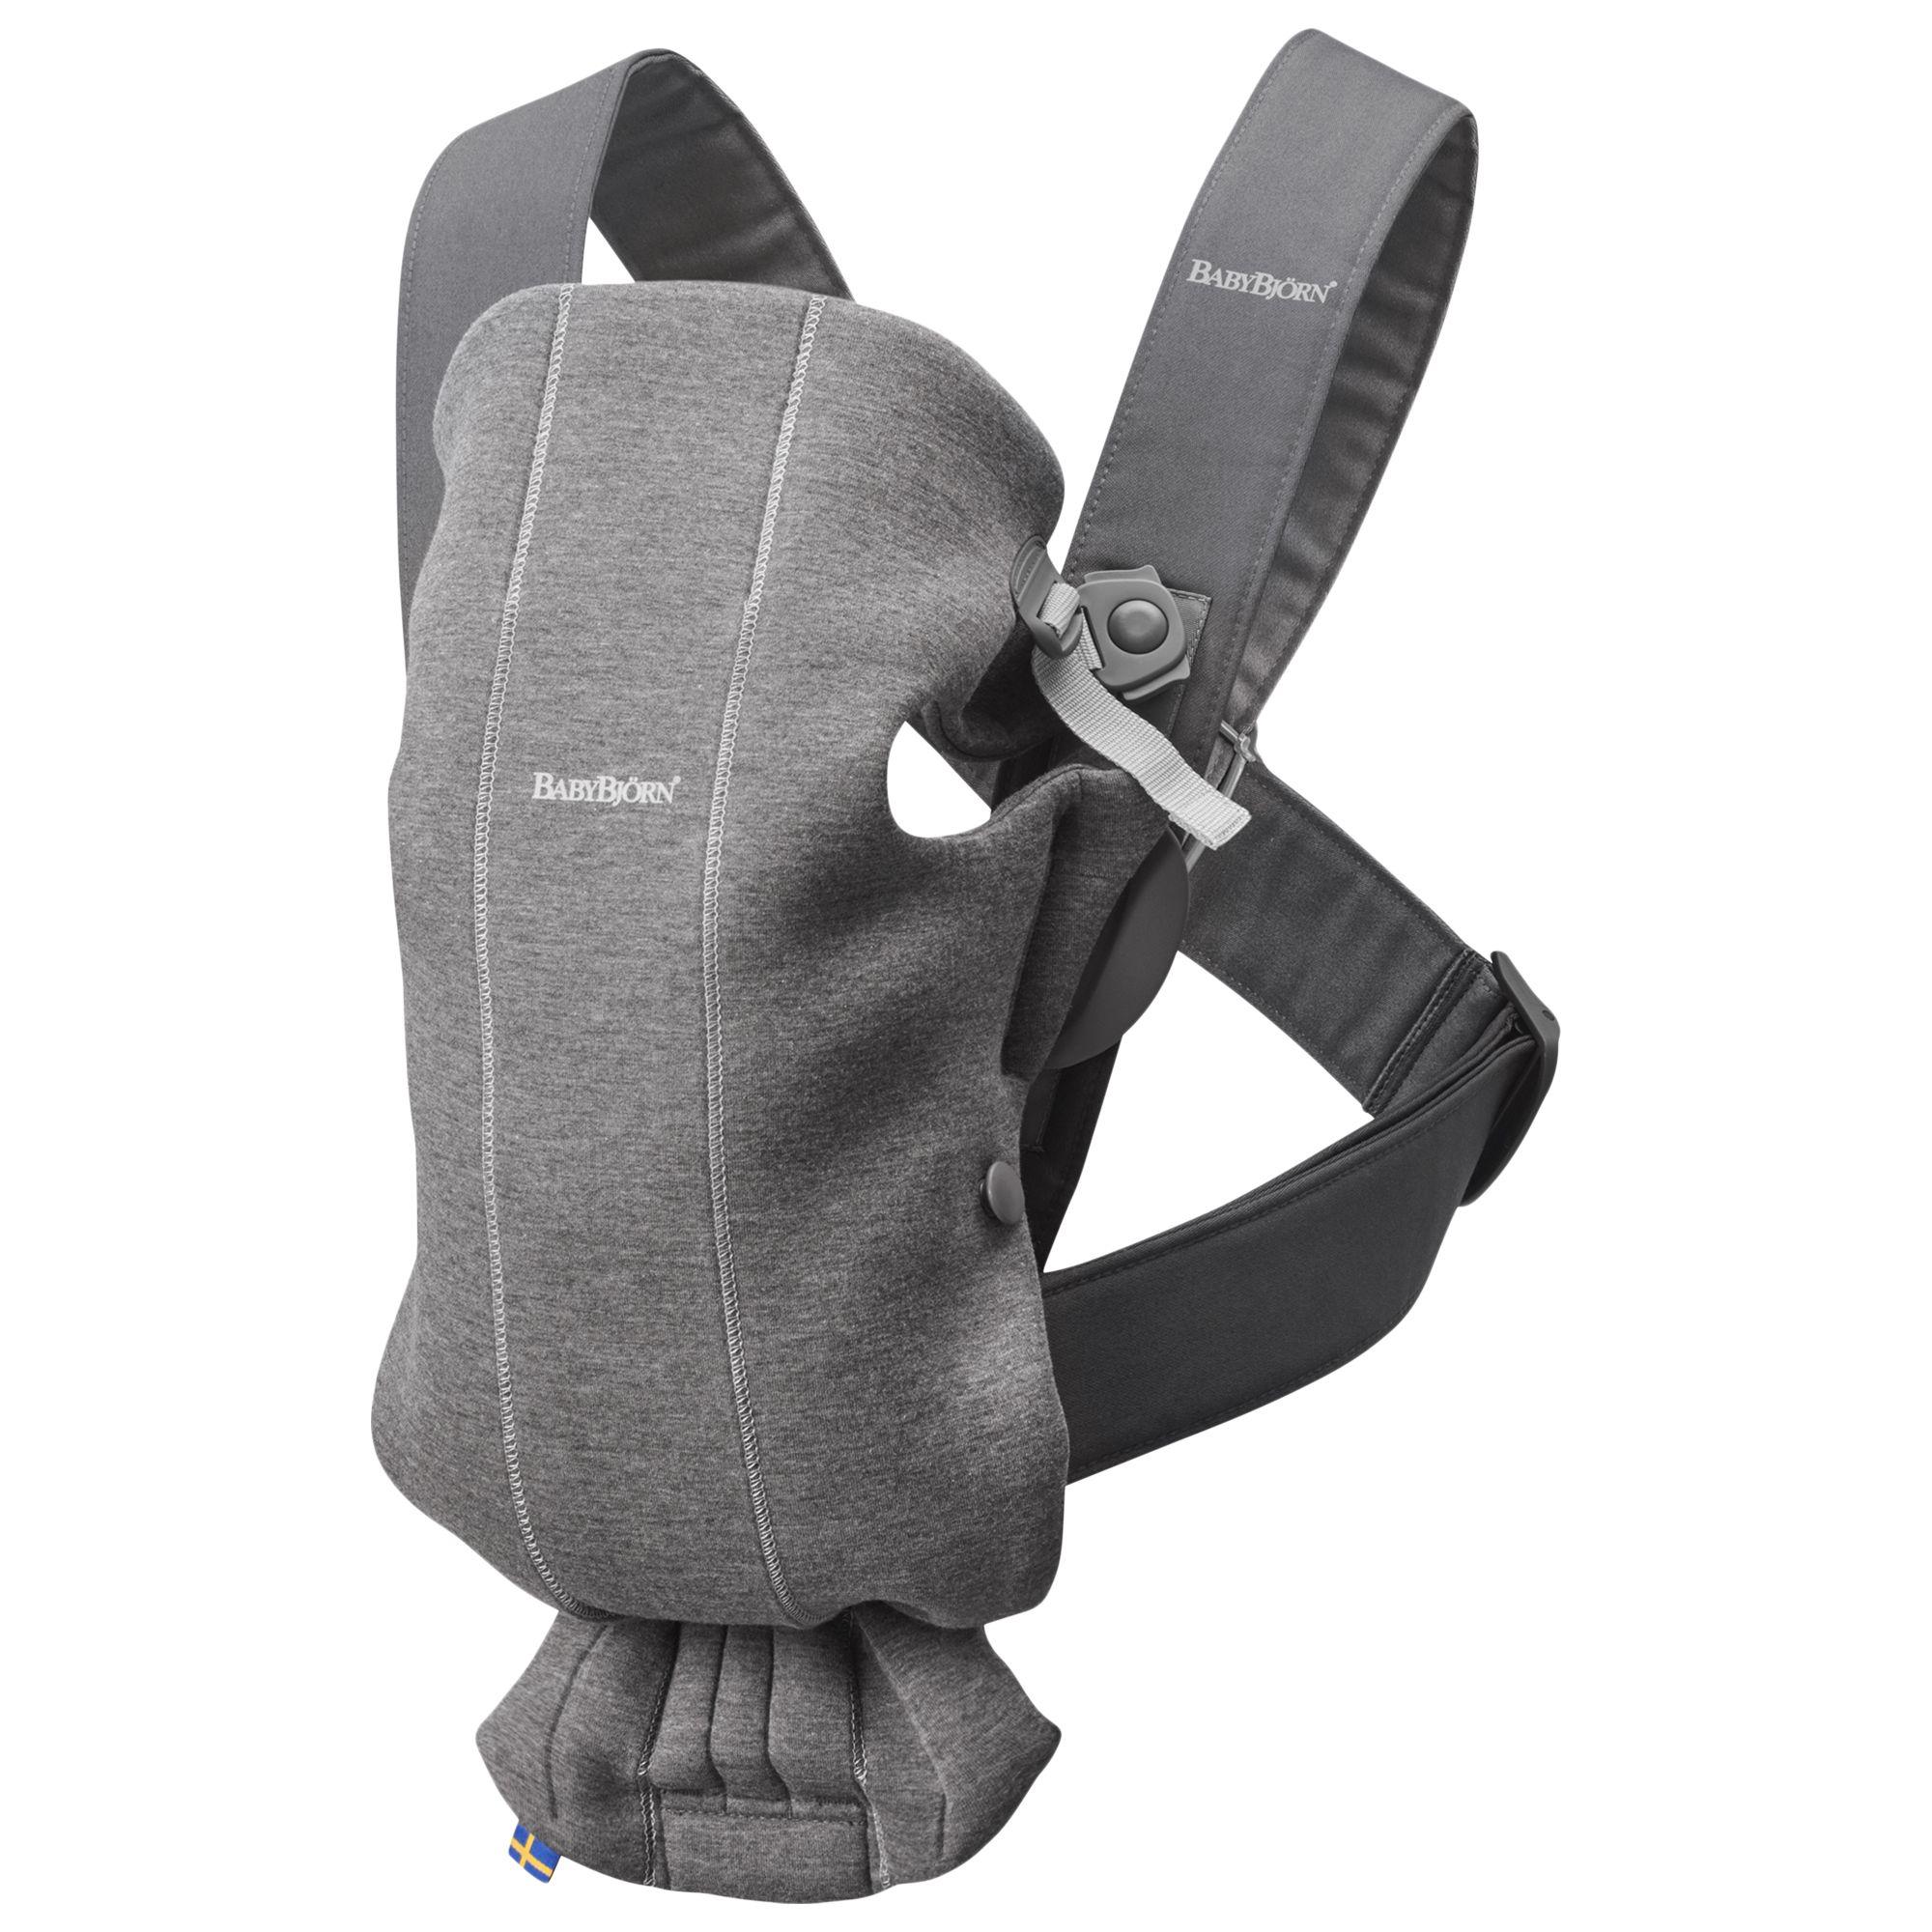 BabyBjorn BabyBjörn Mini Carrier, Dark Grey